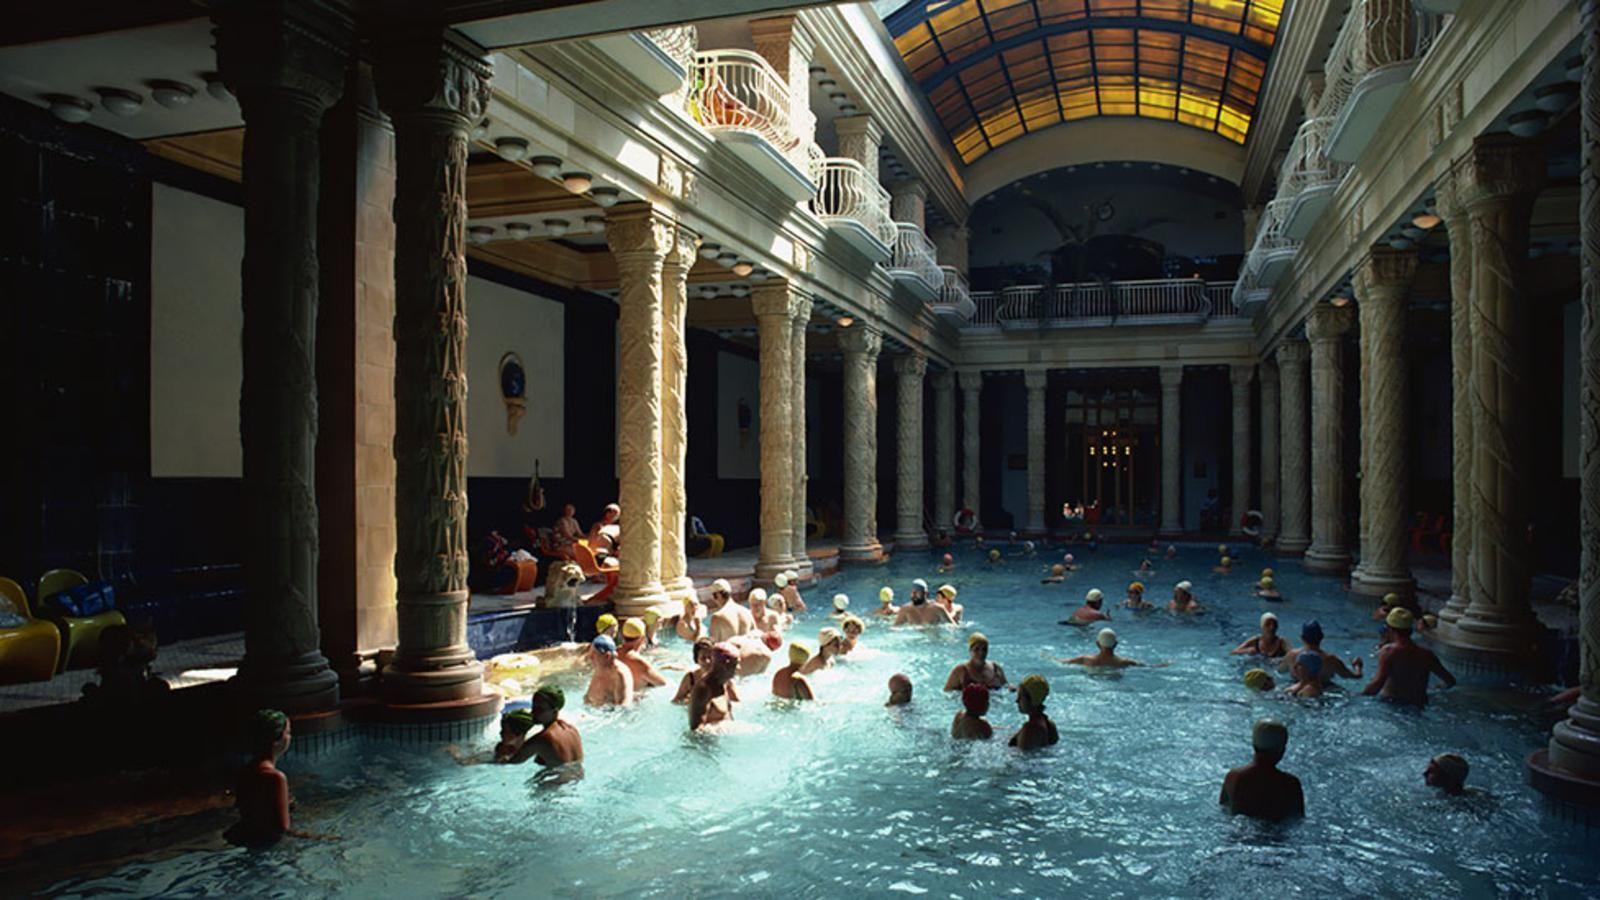 The Most Beautiful Swimming Pools Inspiração